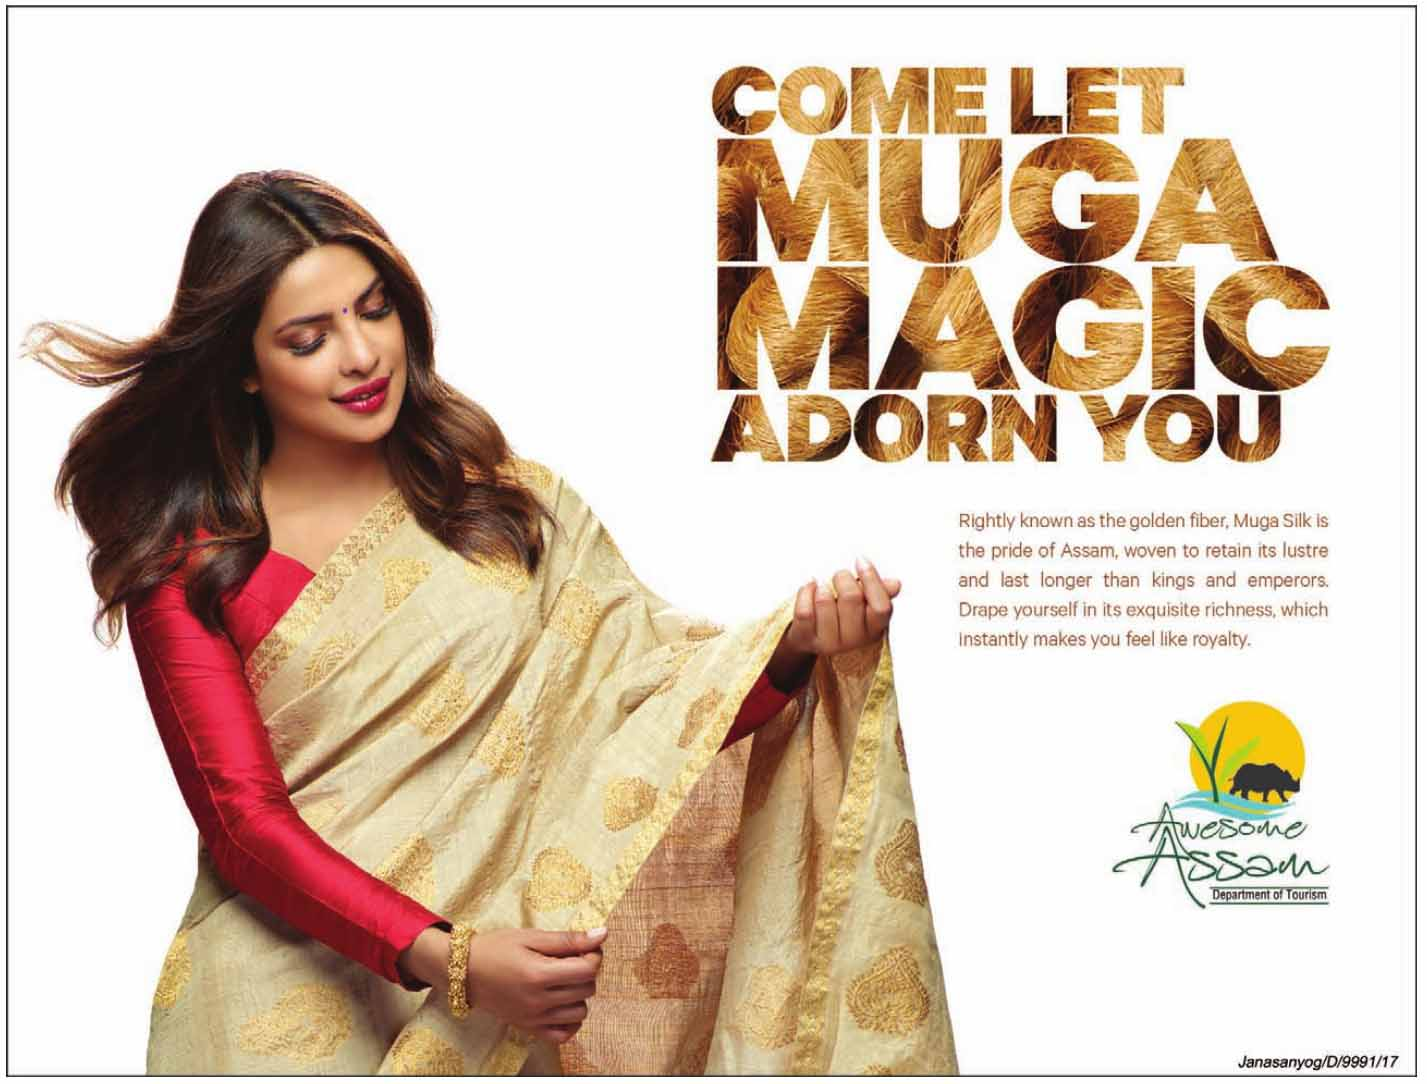 A Crore Spent, Just To Get Priyanka Chopra To Assam?